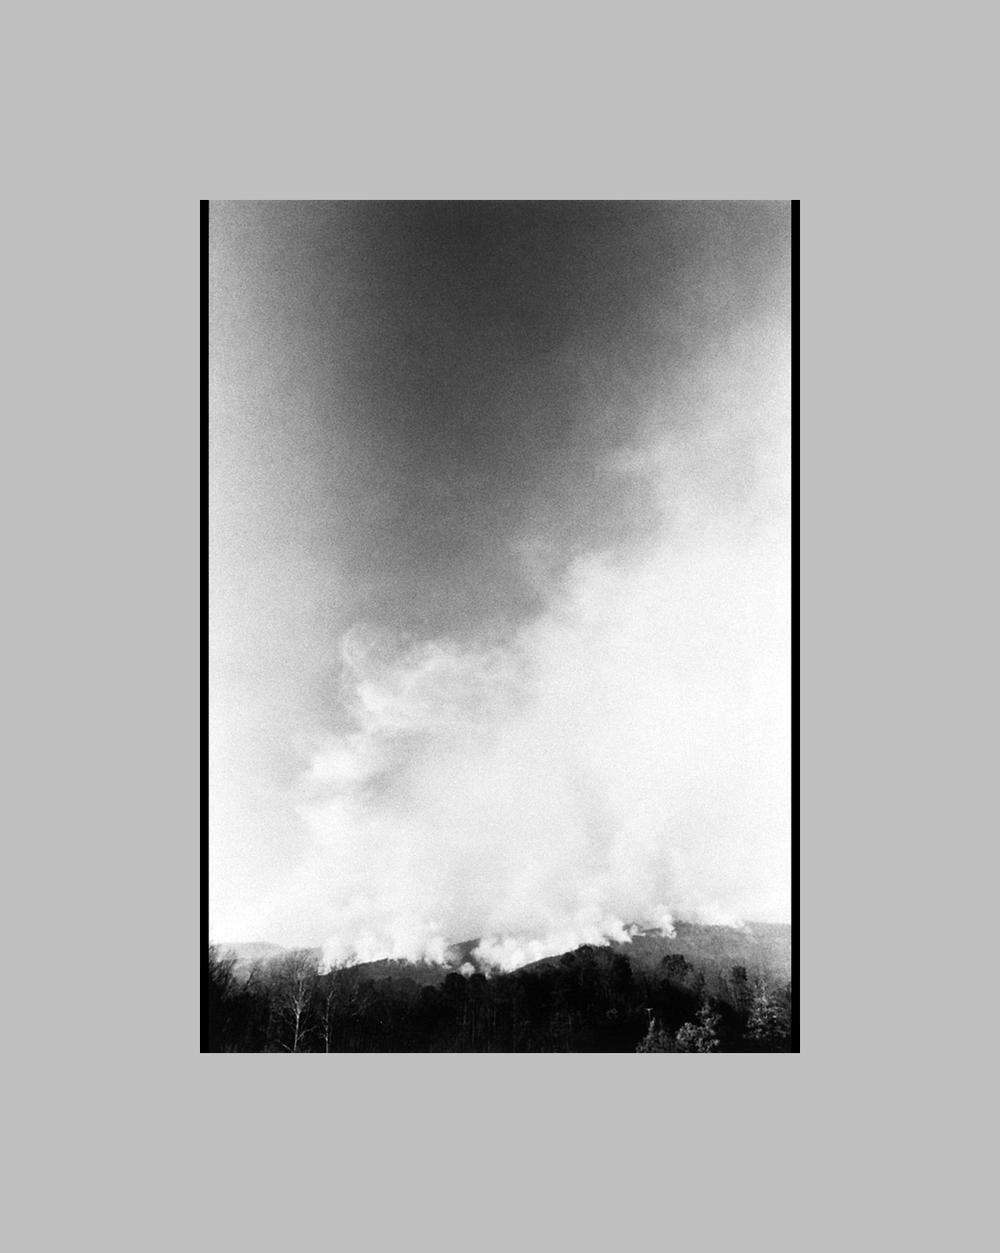 Virginia, Forest Fire, 1999